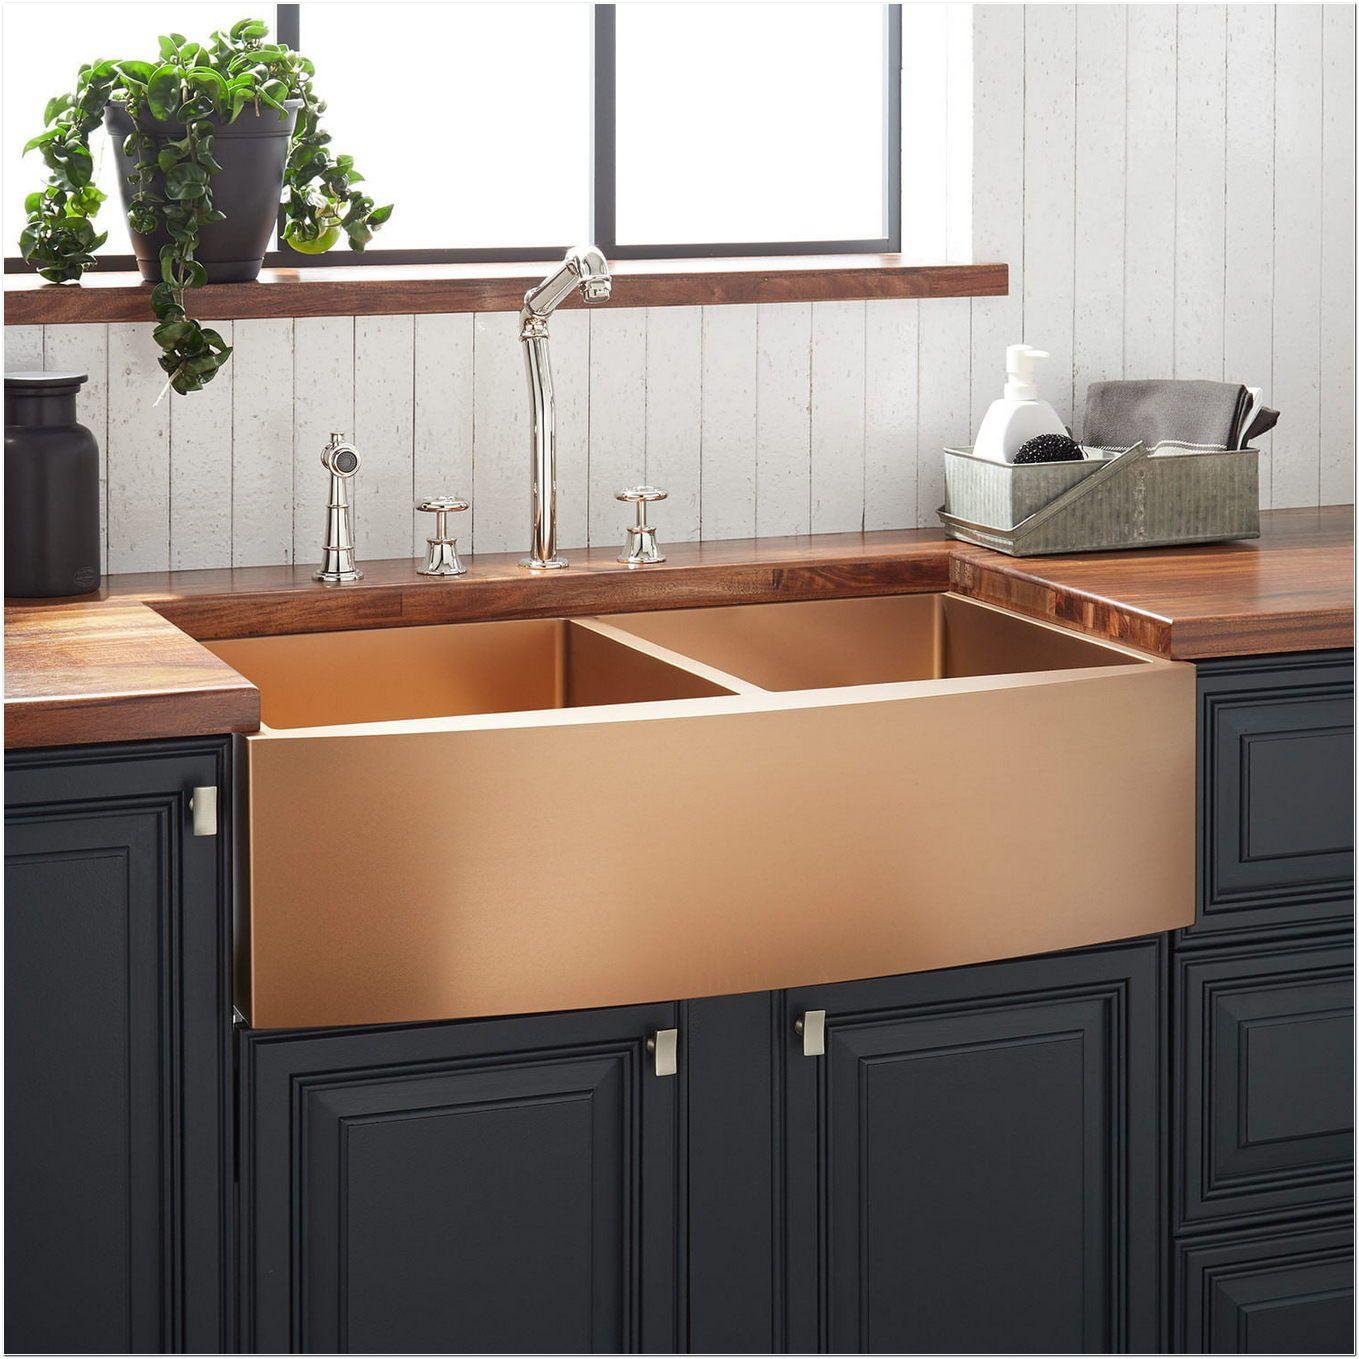 39 double basin farmhouse kitchen sink with basket